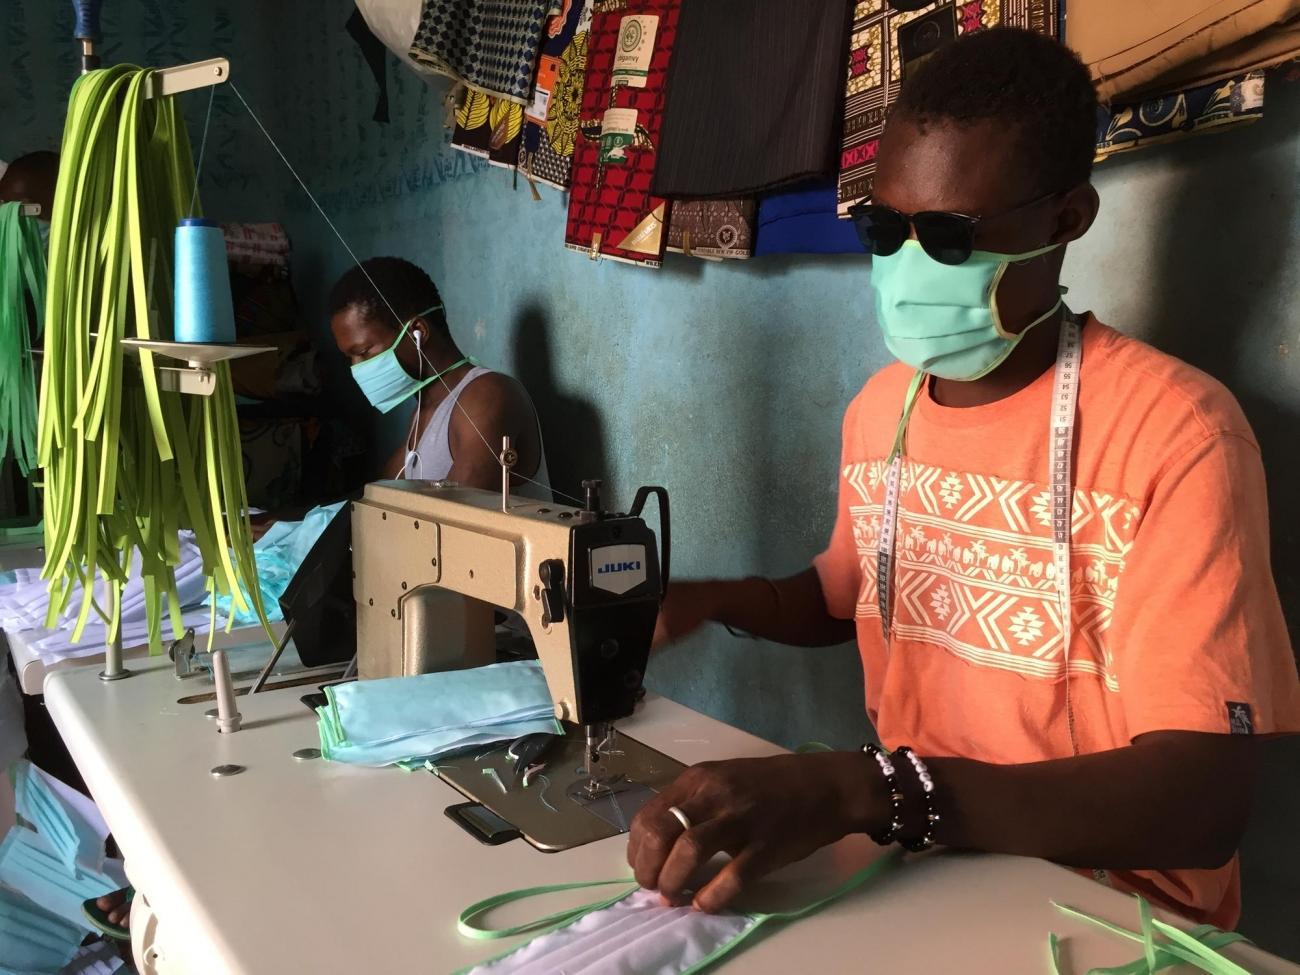 Fabrication de masques dans un atelier de couture à Bamako, Mali.  © Lamine Keita/MSF